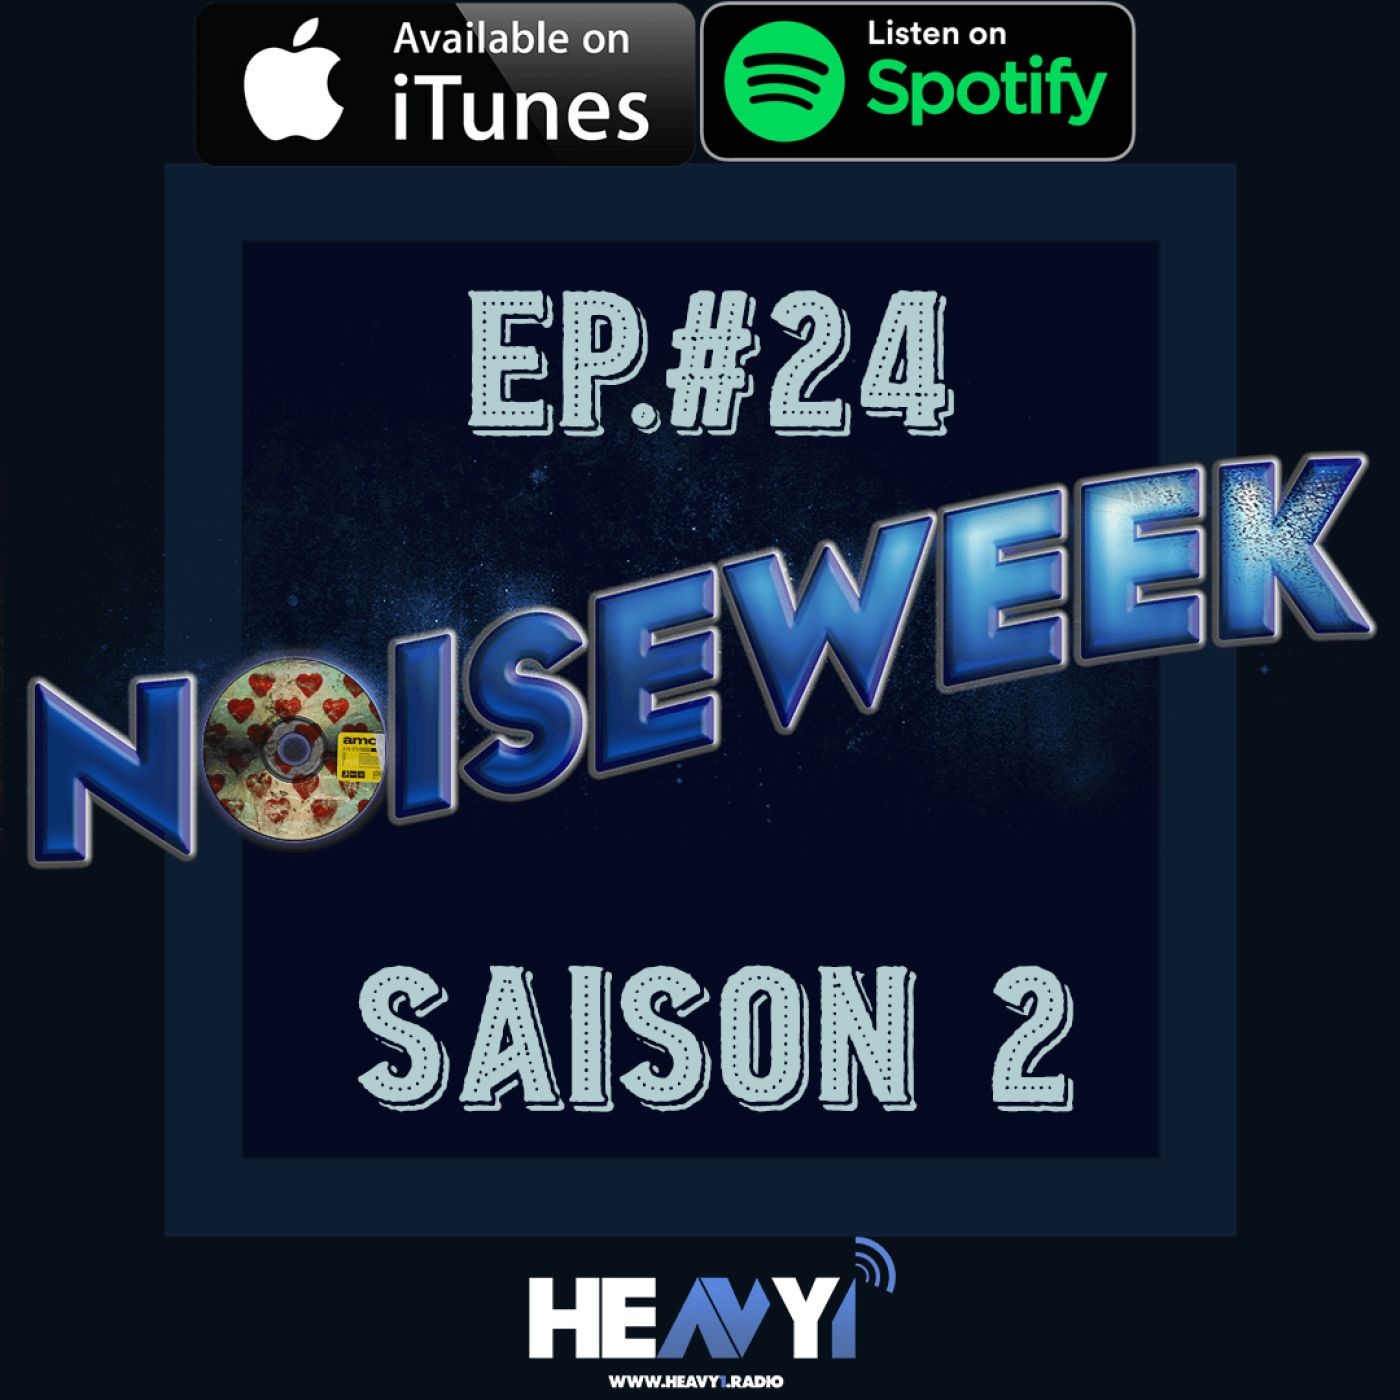 Noiseweek #24 Saison 2